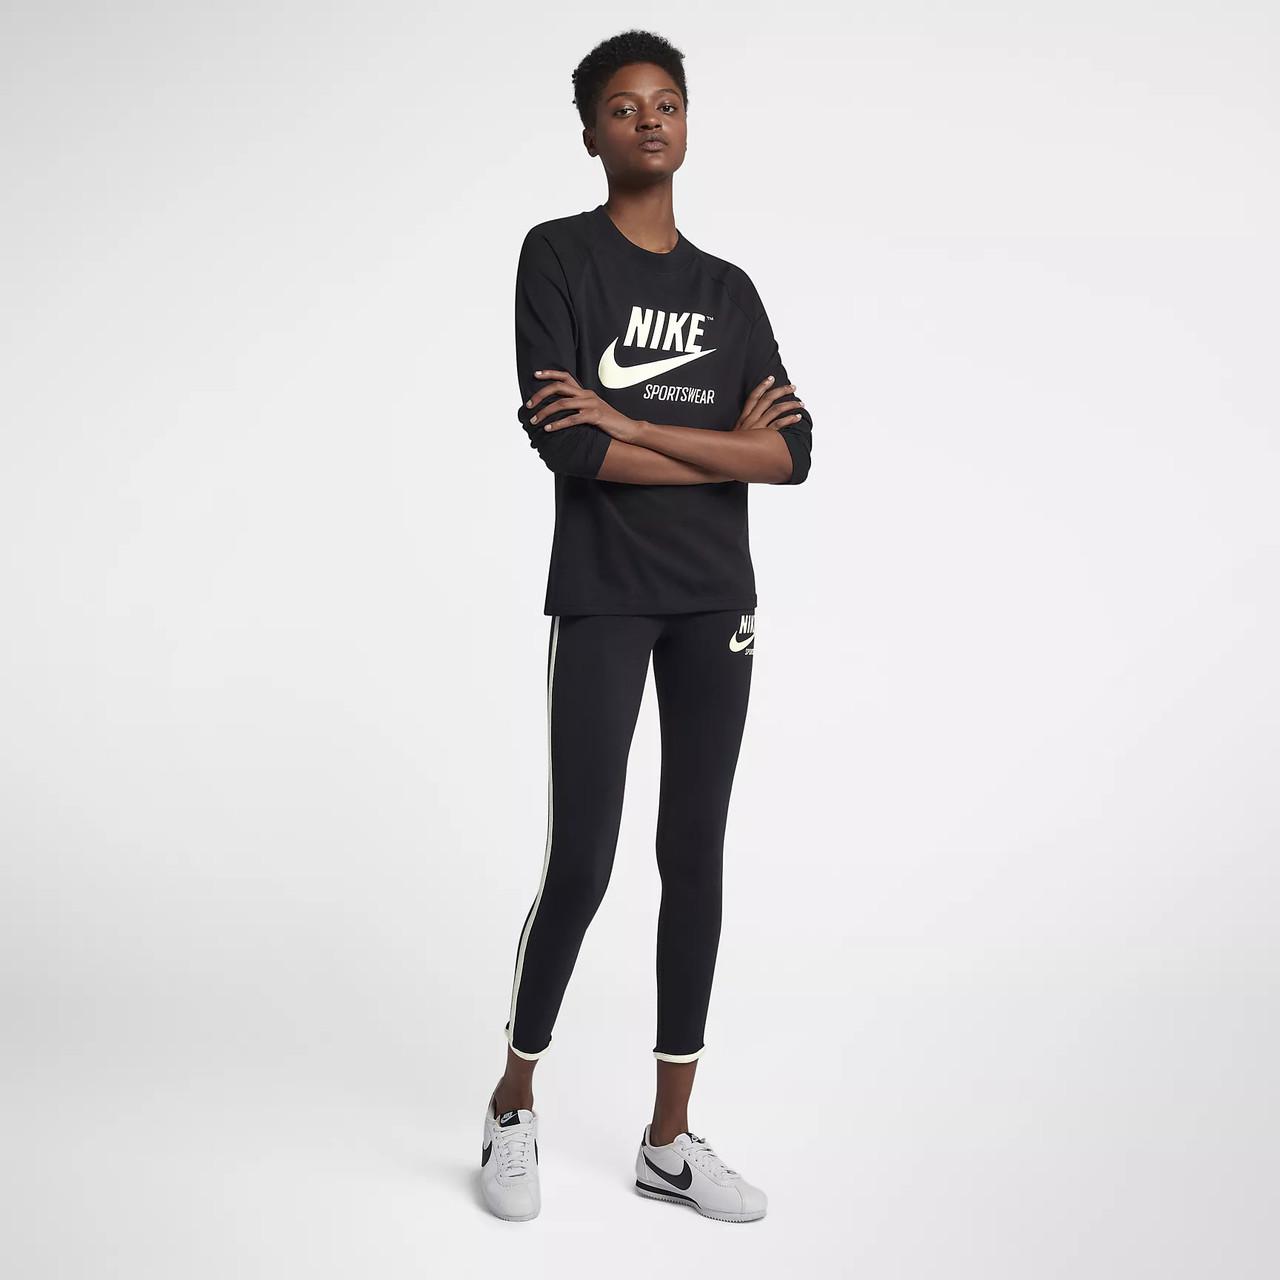 def5f876 Женская Толстовка Nike Sportswear Long Sleeve Tee 883521-010 (Оригинал),  цена 989,10 грн., купить в Киеве — Prom.ua (ID#721063106)